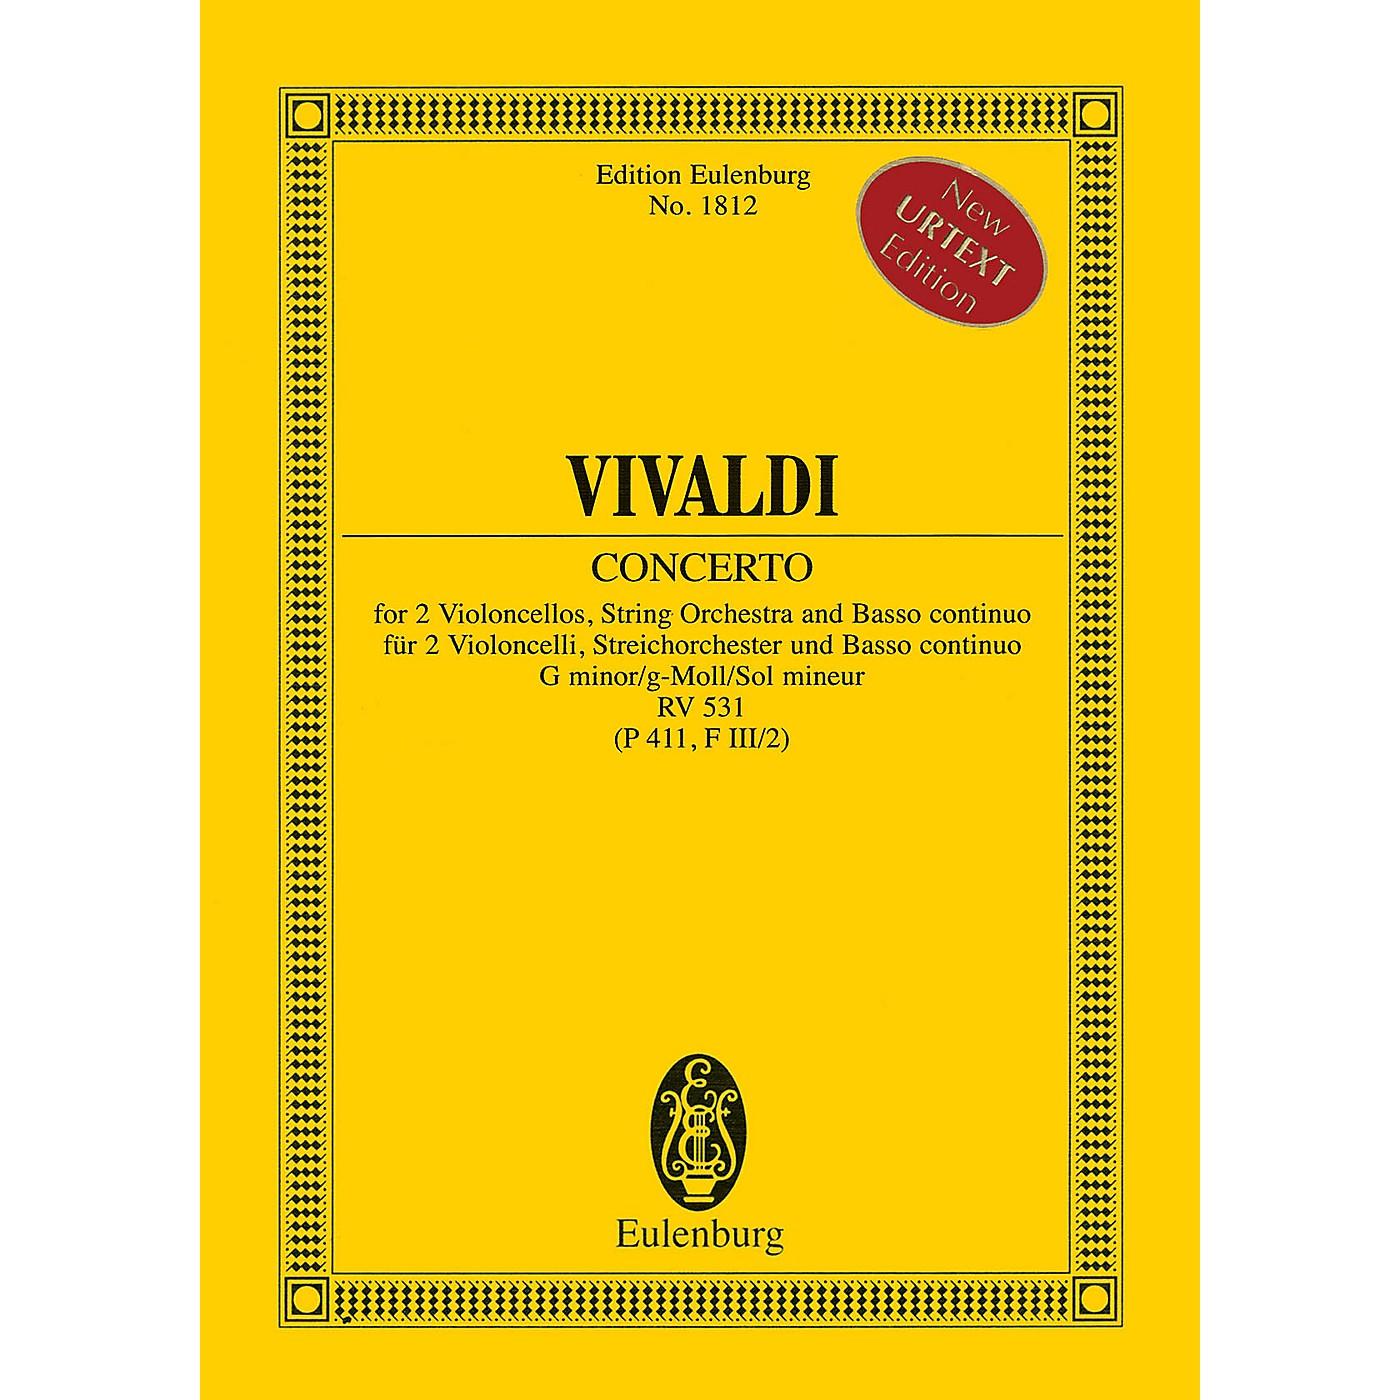 Eulenburg Concerto in G minor RV 531 (P 411, F III/2) Study Score Series Softcover Composed by Antonio Vivaldi thumbnail